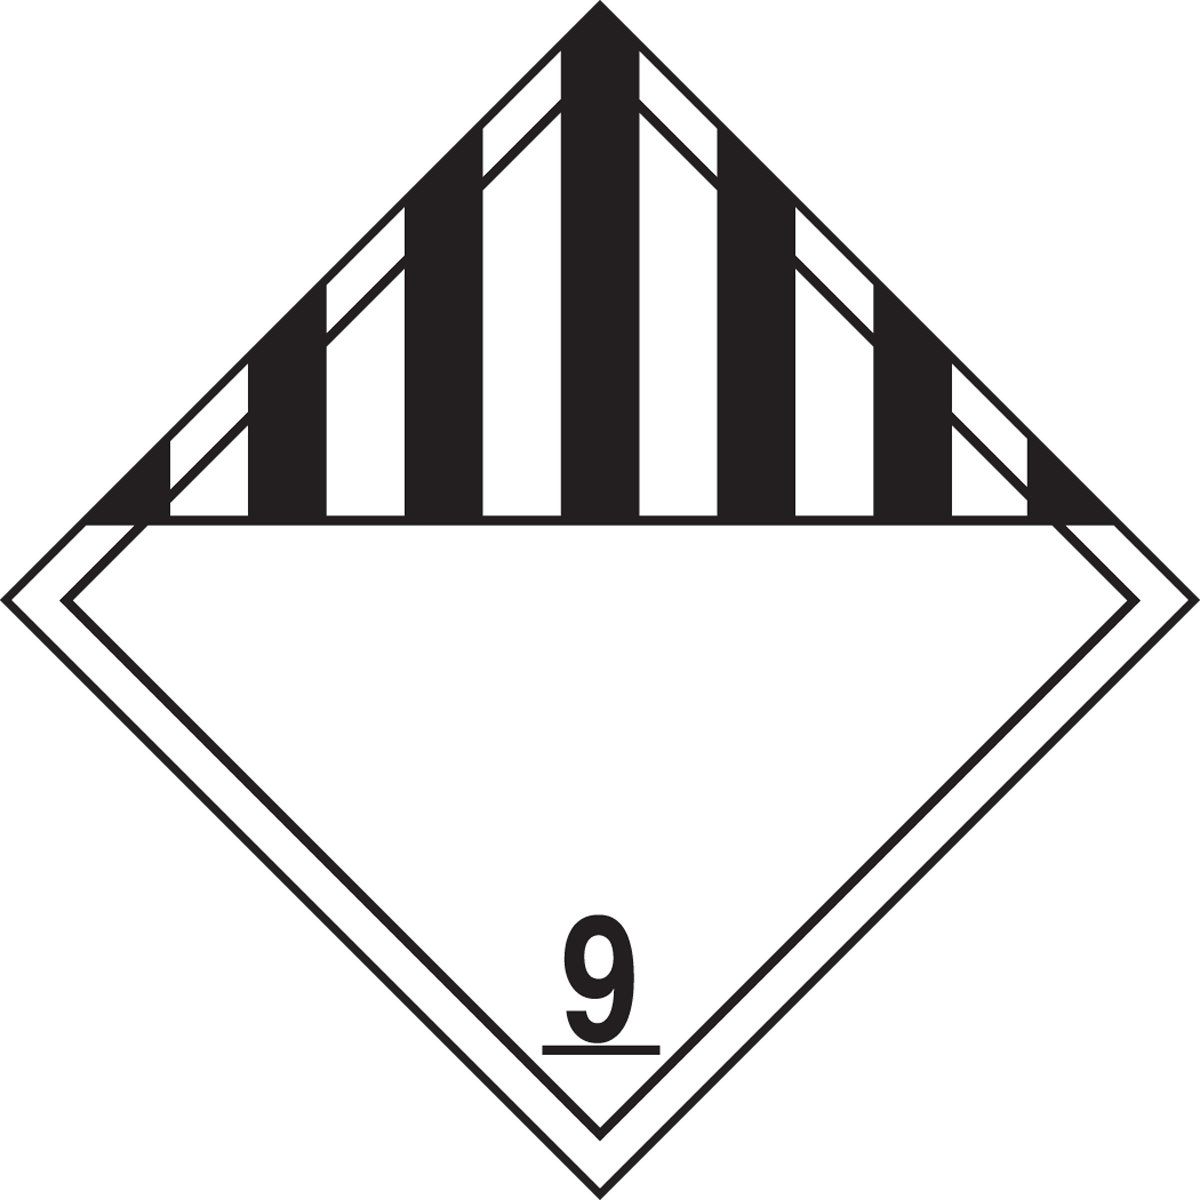 Accuform MPL901VS50 Adhesive Vinyl Hazard Class 9 Miscellaneous Dangerous Goods DOT Placard Pack of 50 Legend9 Black on White 10-3//4 Width x 10-3//4 Length